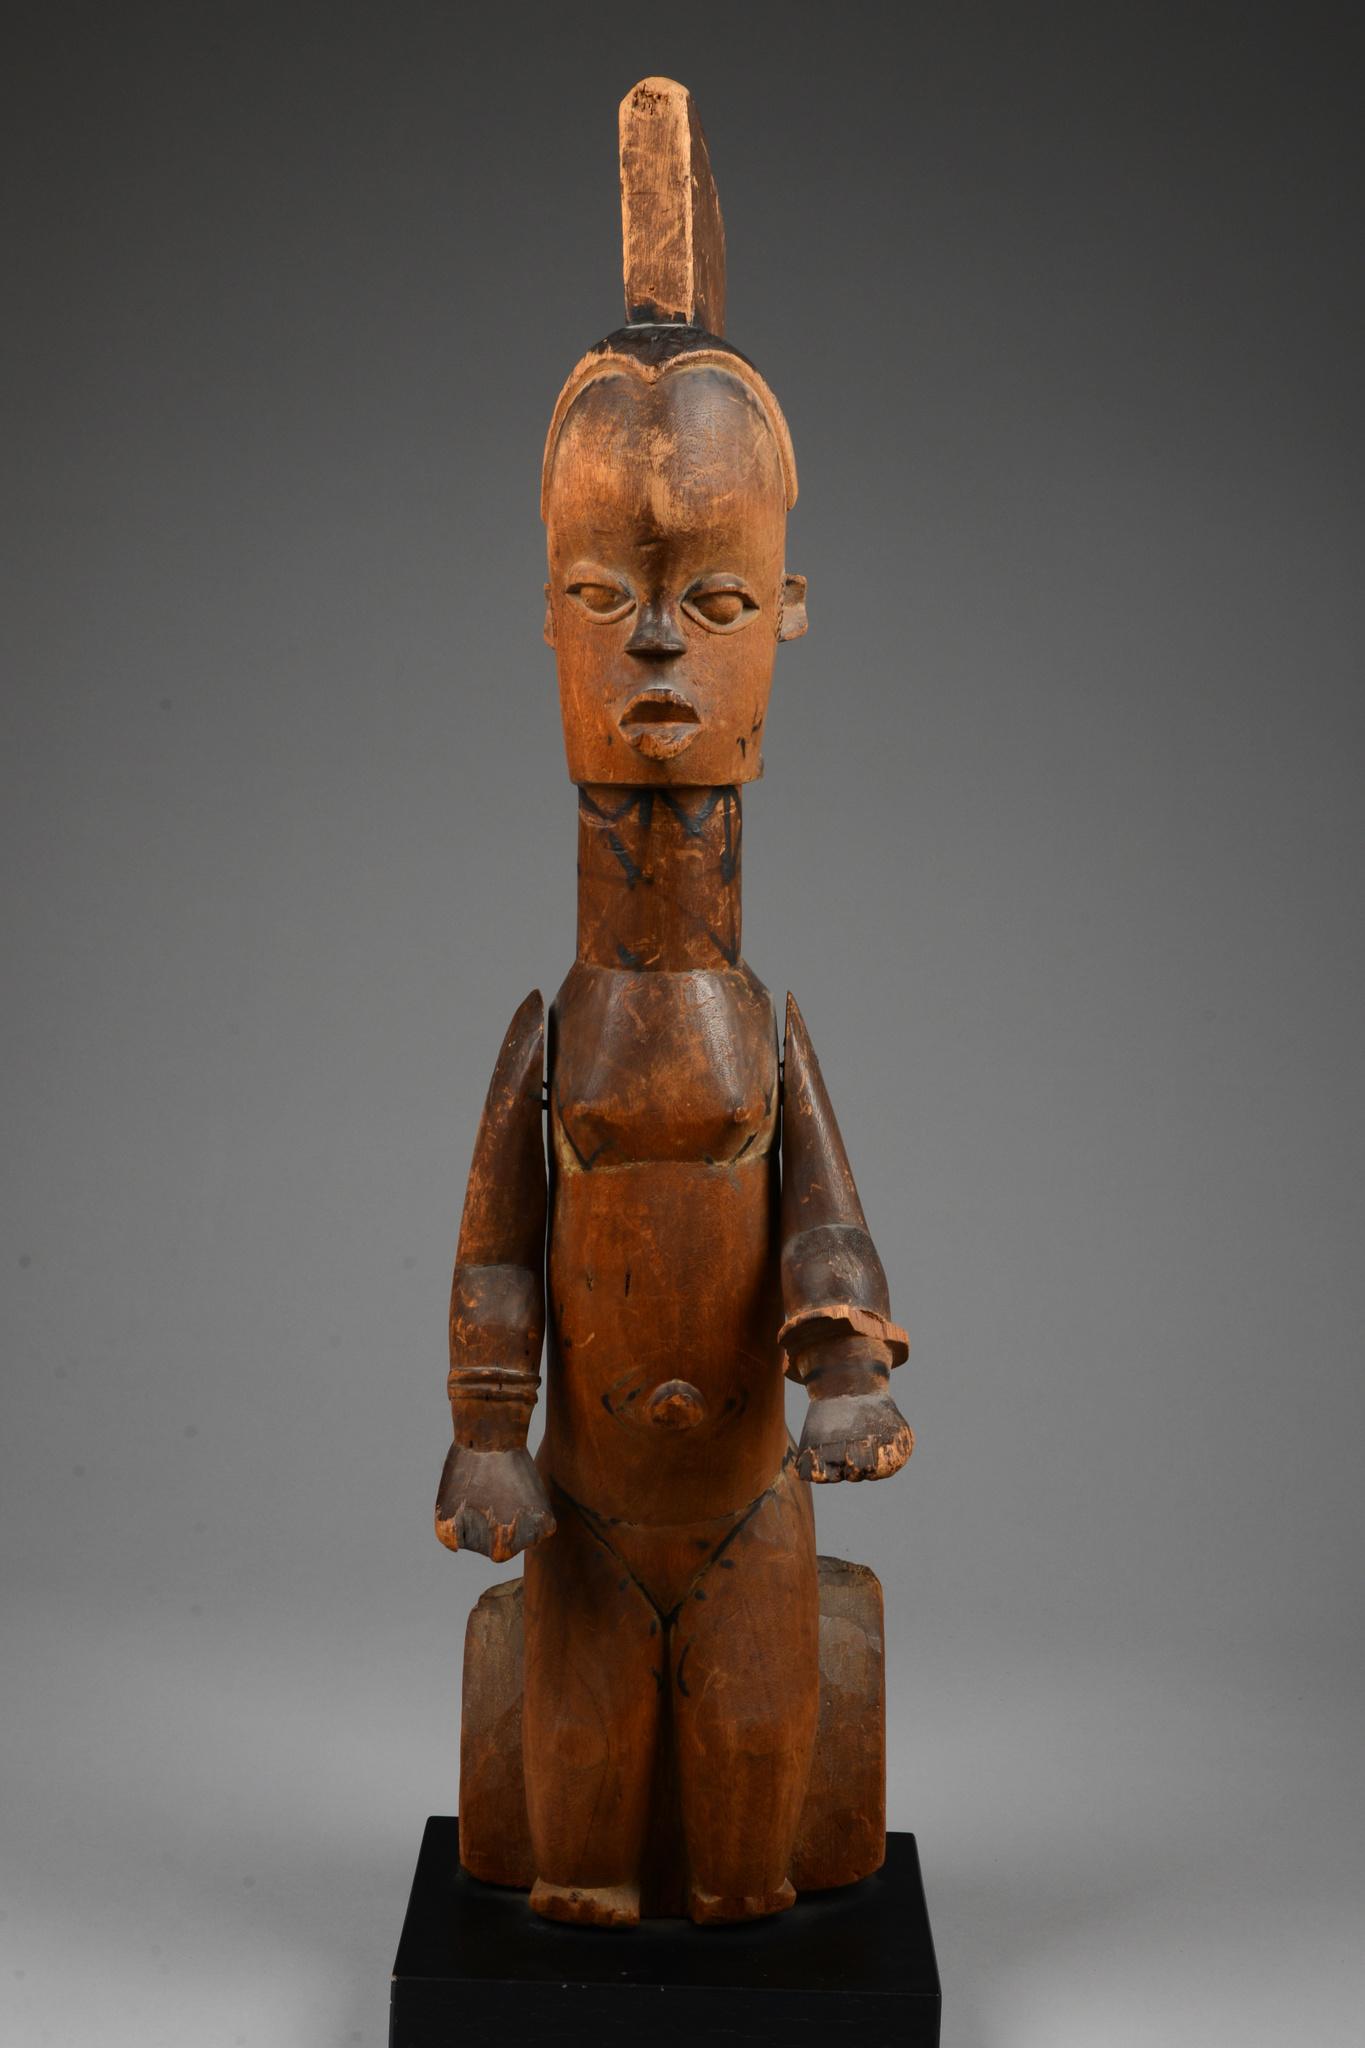 Seated female puppet figure